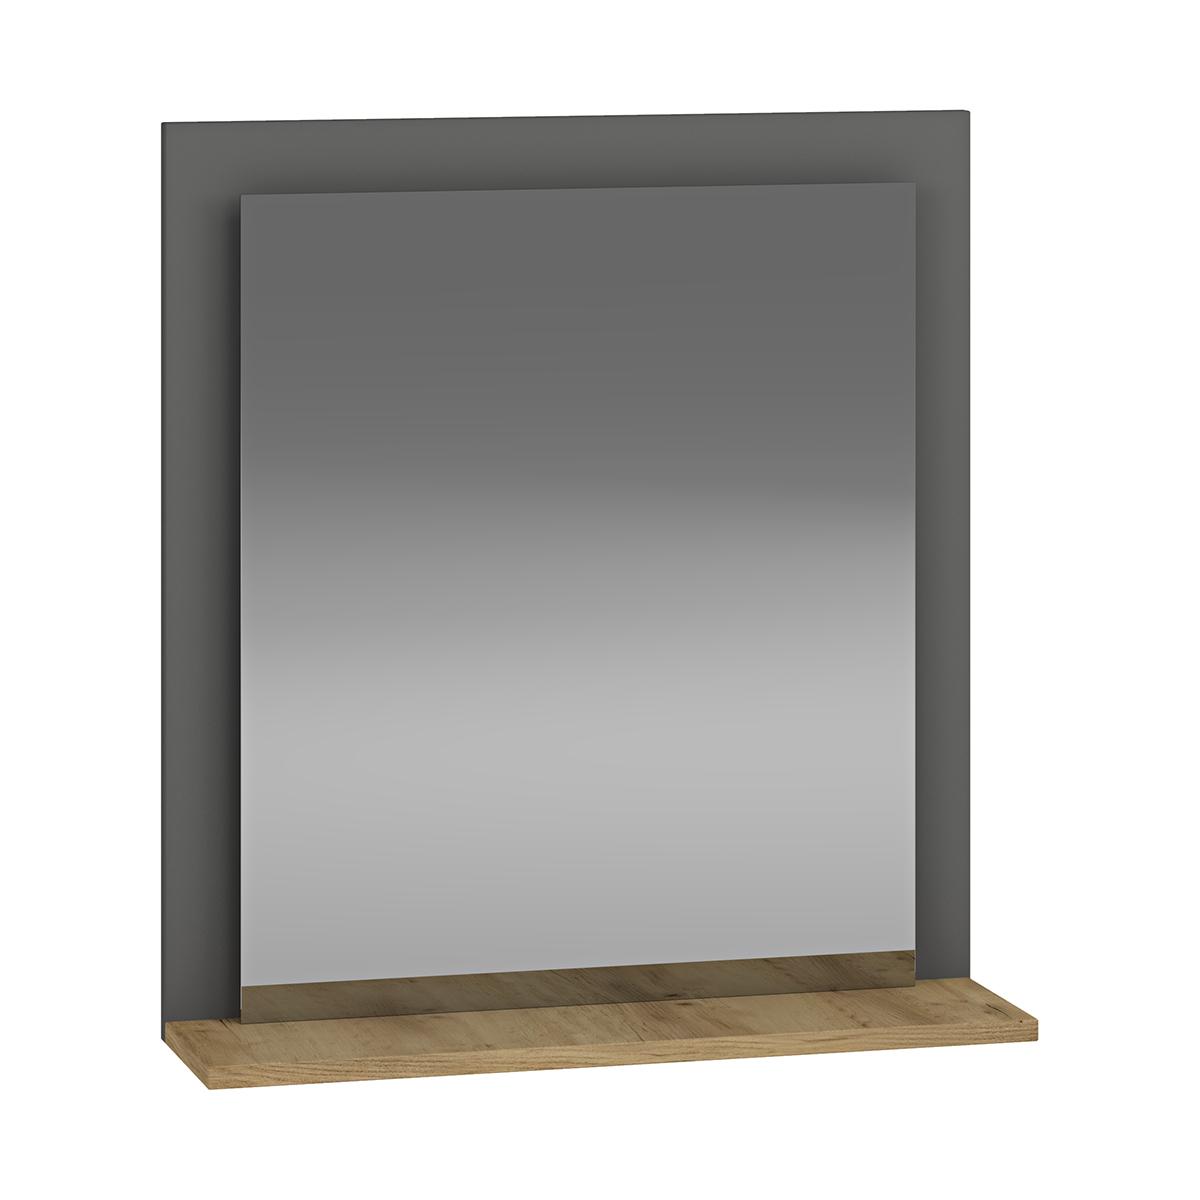 NABBI Baleta Z60 zrkadlo na stenu antracit / craft zlatý